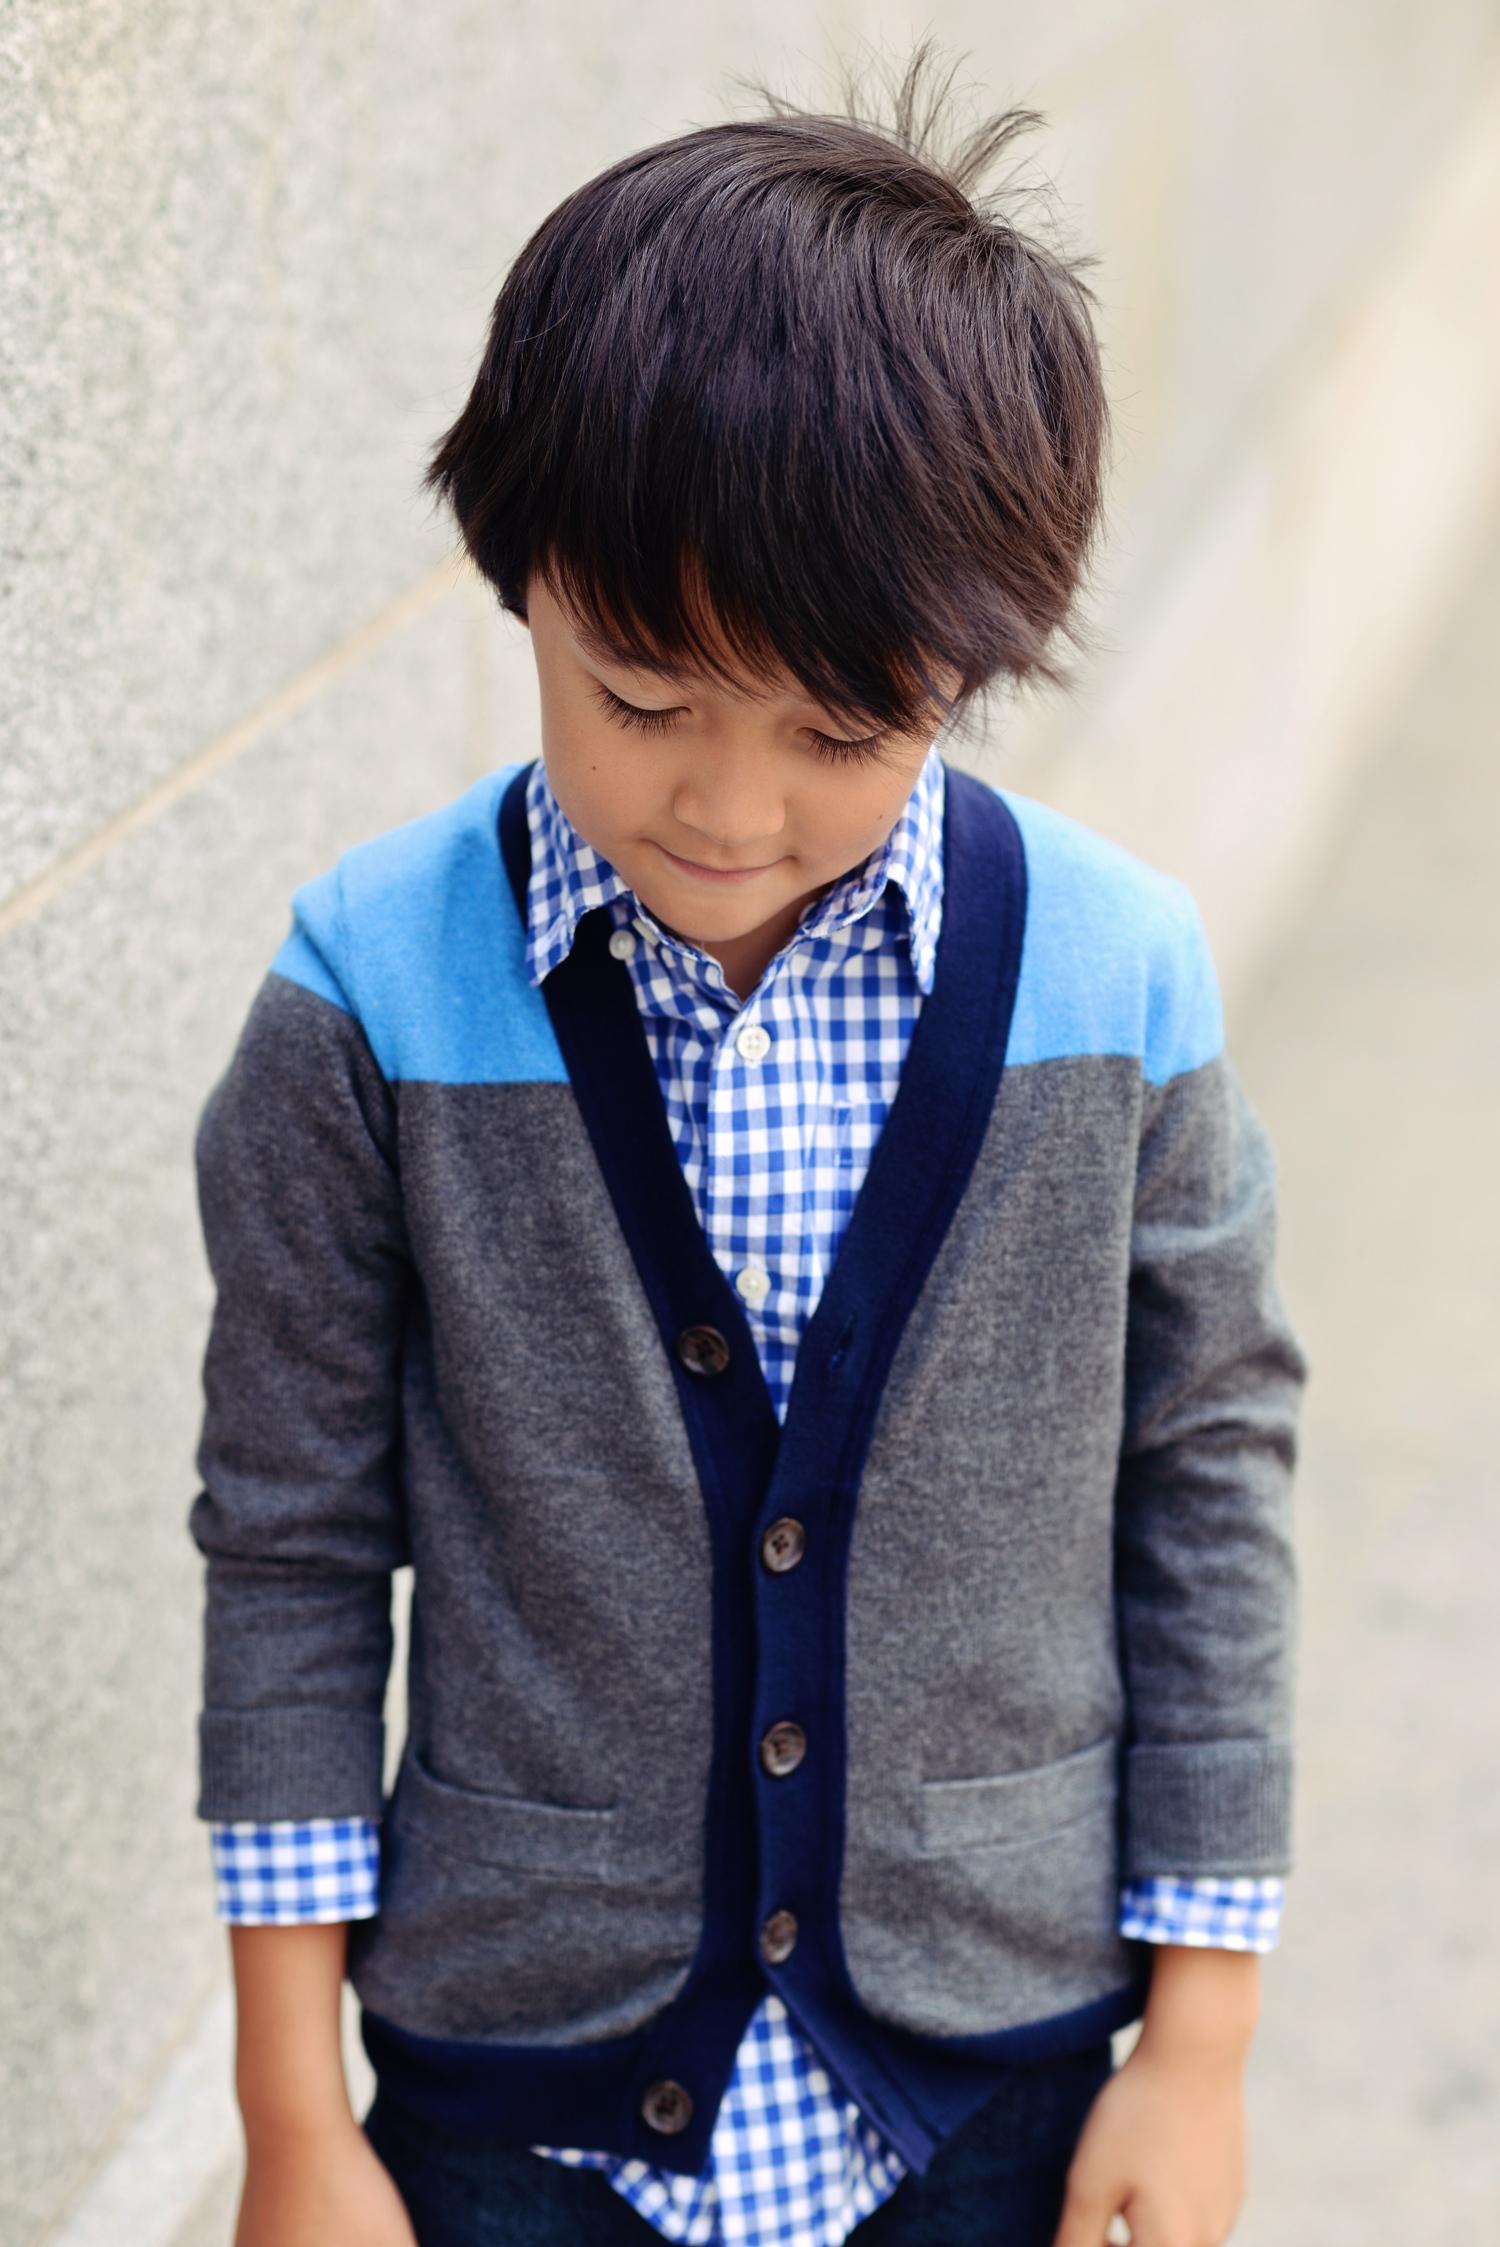 Enfant+Street+Style+by+Gina+Kim+Photography-52.jpeg